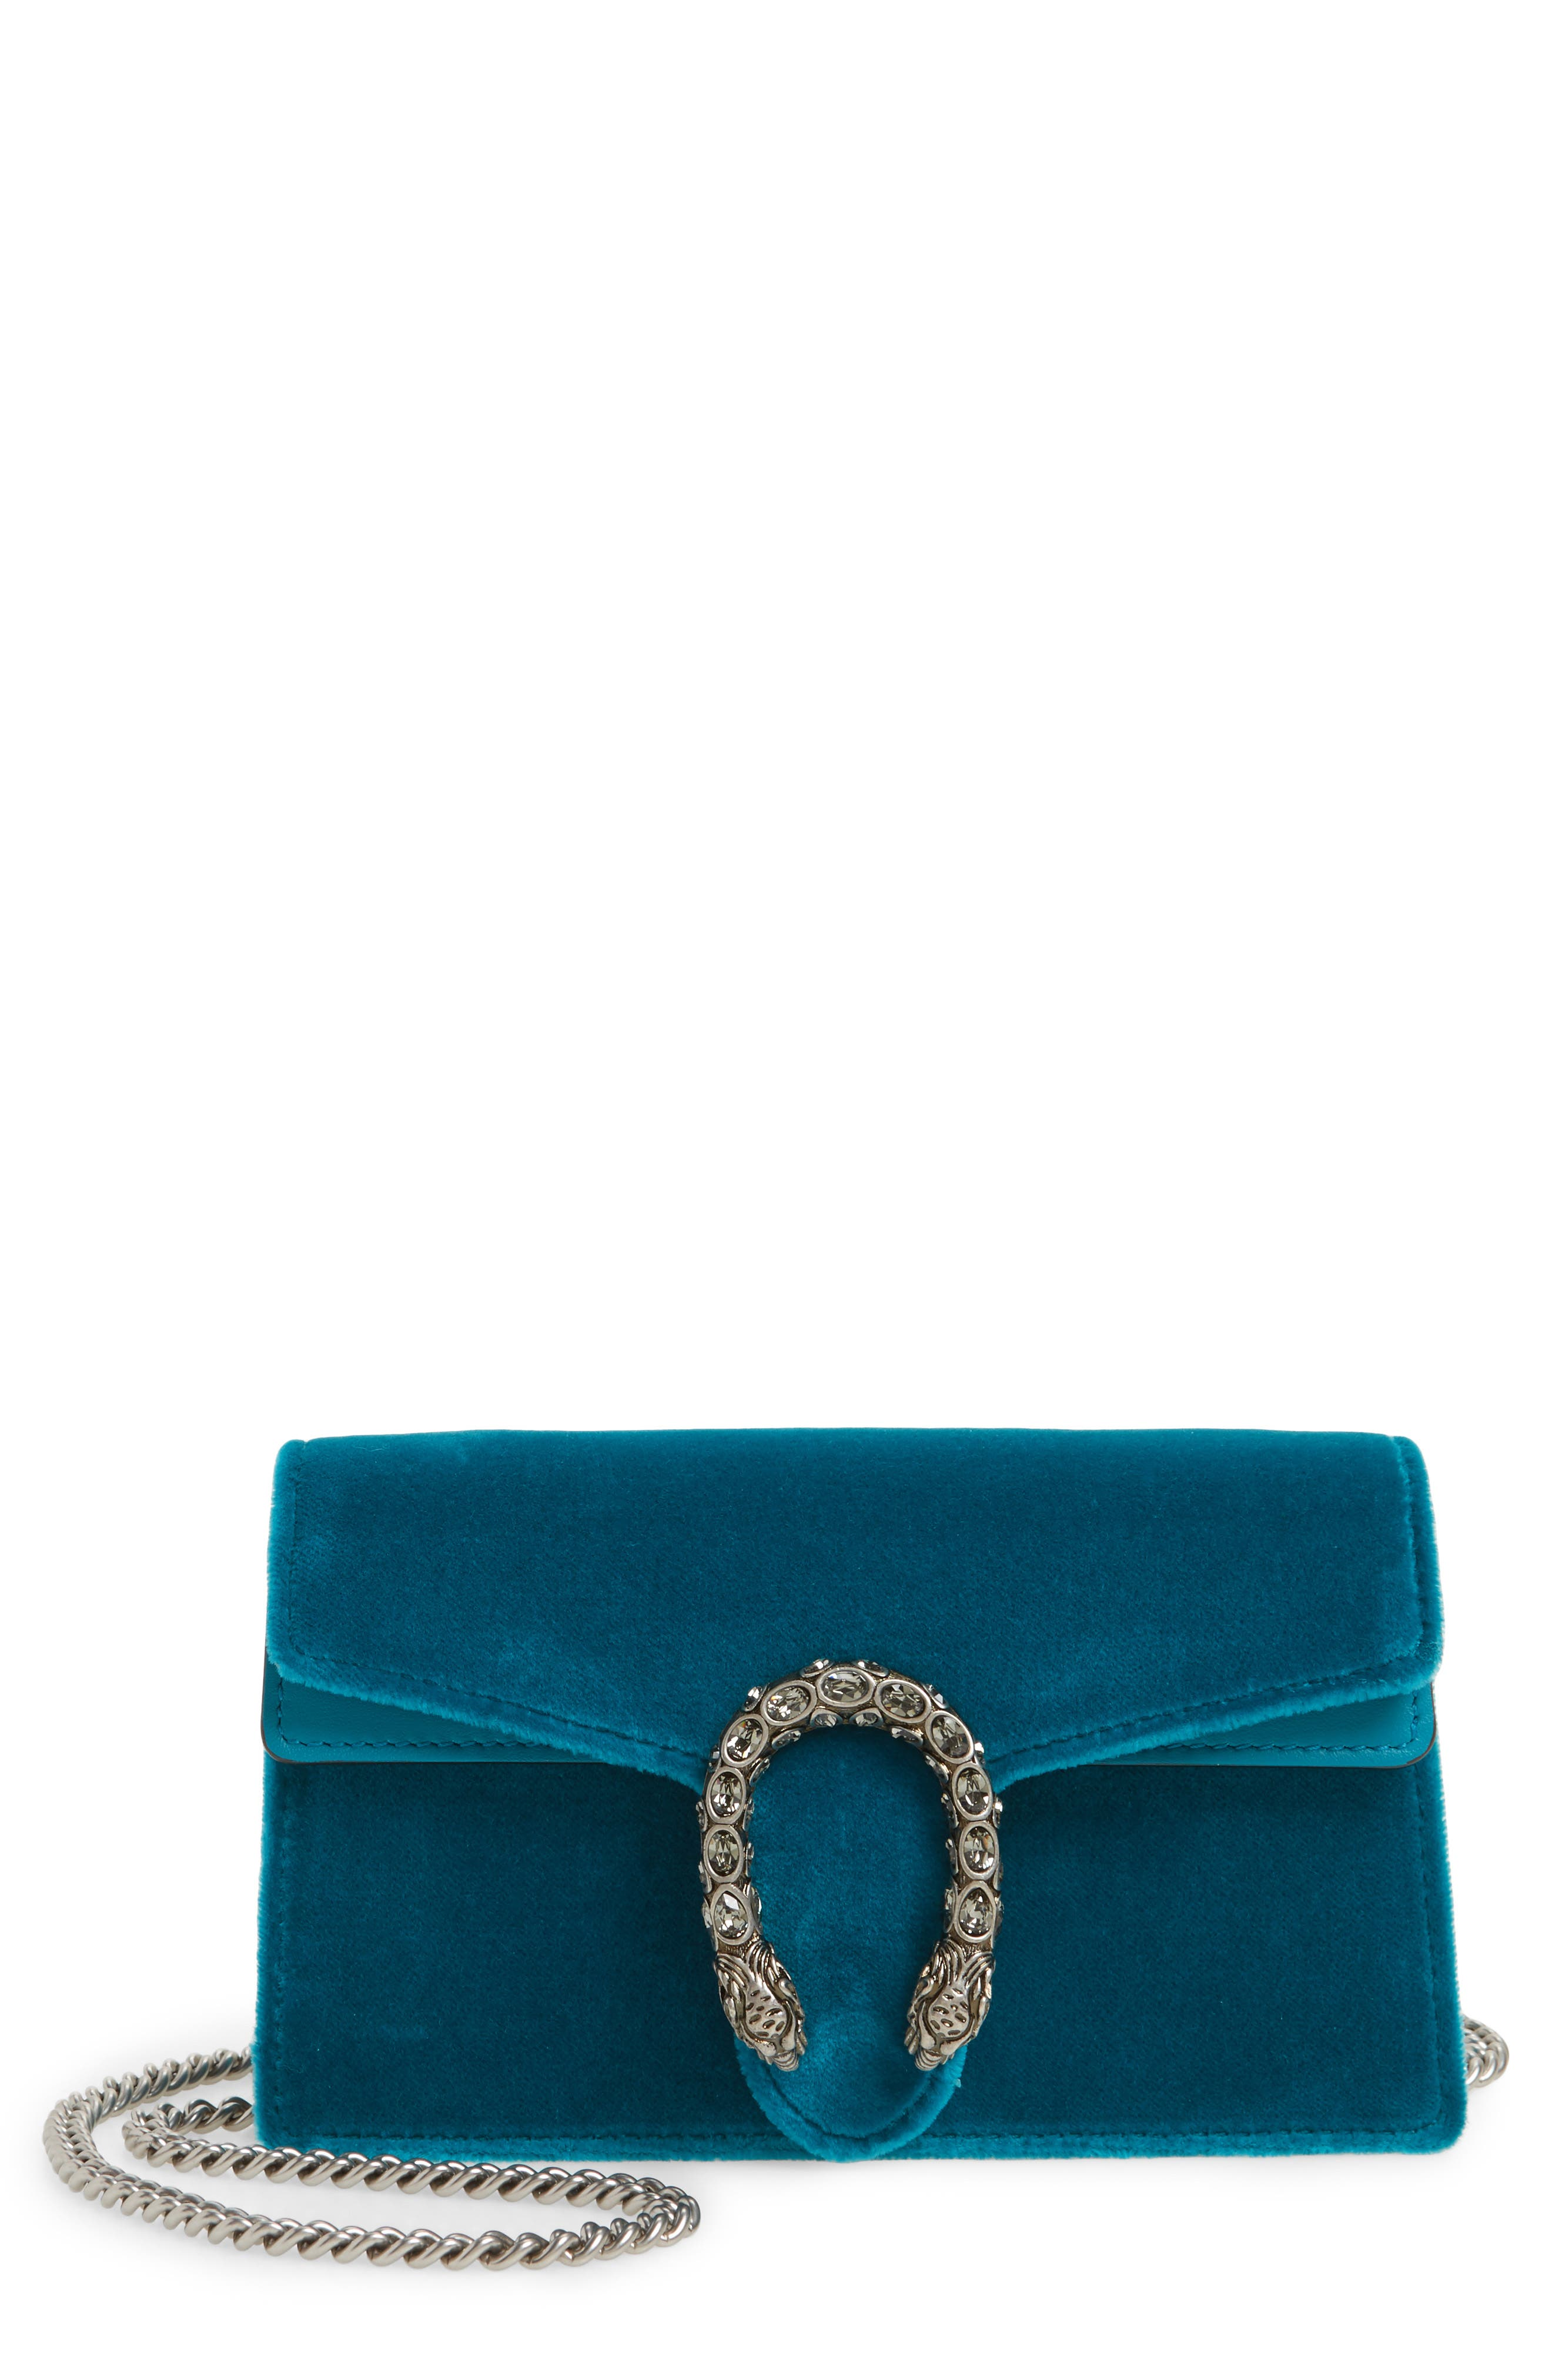 gucci bags at nordstrom. main image - gucci super mini dionysus velvet shoulder bag bags at nordstrom